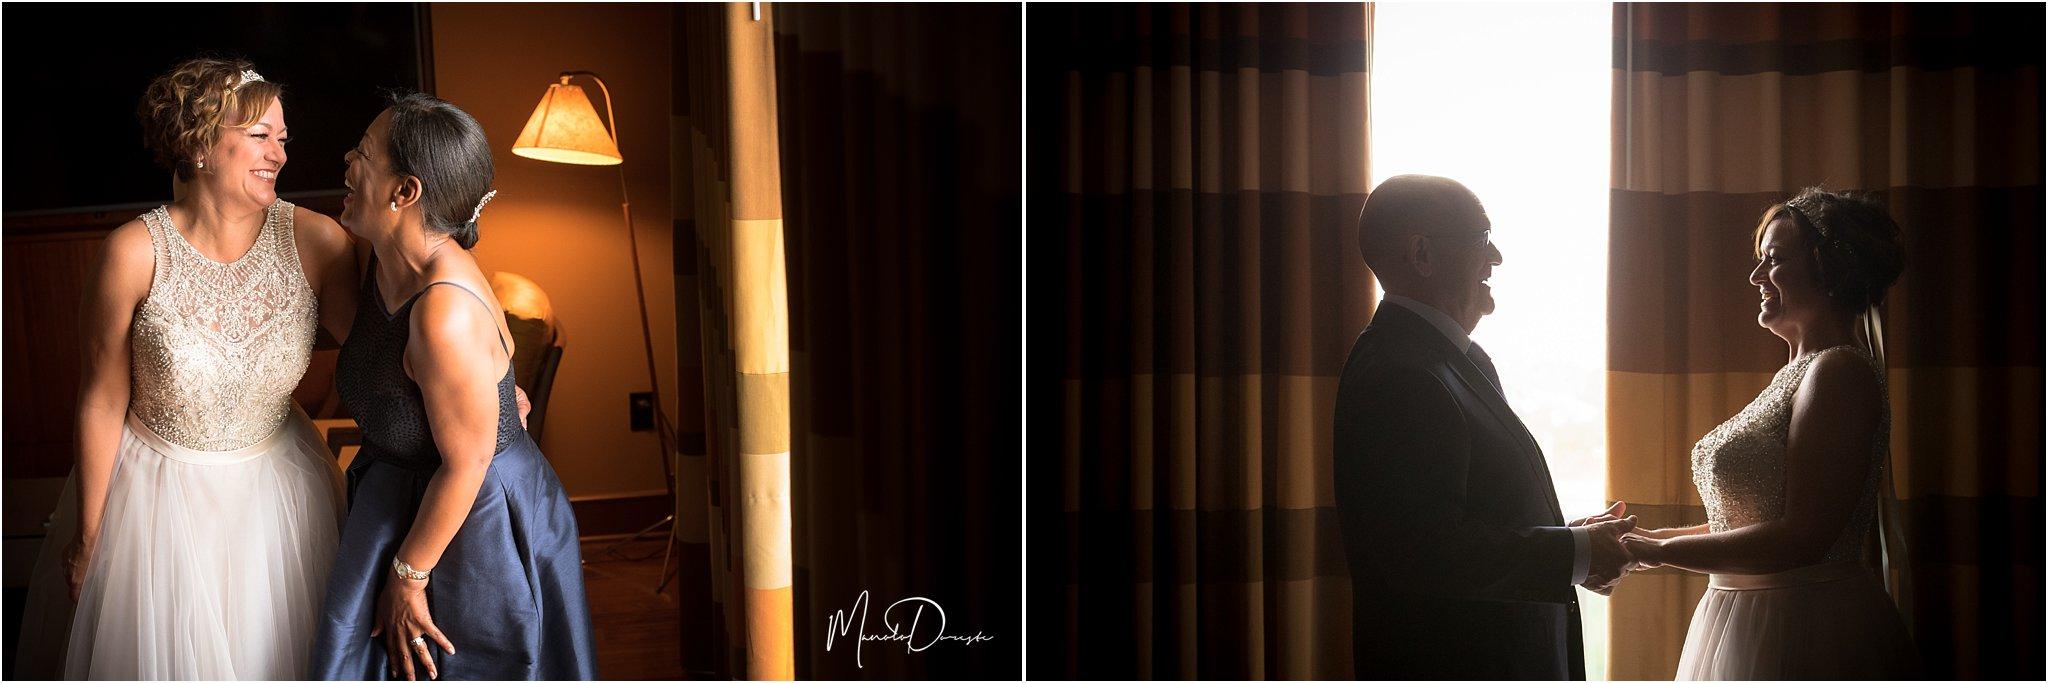 0442_ManoloDoreste_InFocusStudios_Wedding_Family_Photography_Miami_MiamiPhotographer.jpg